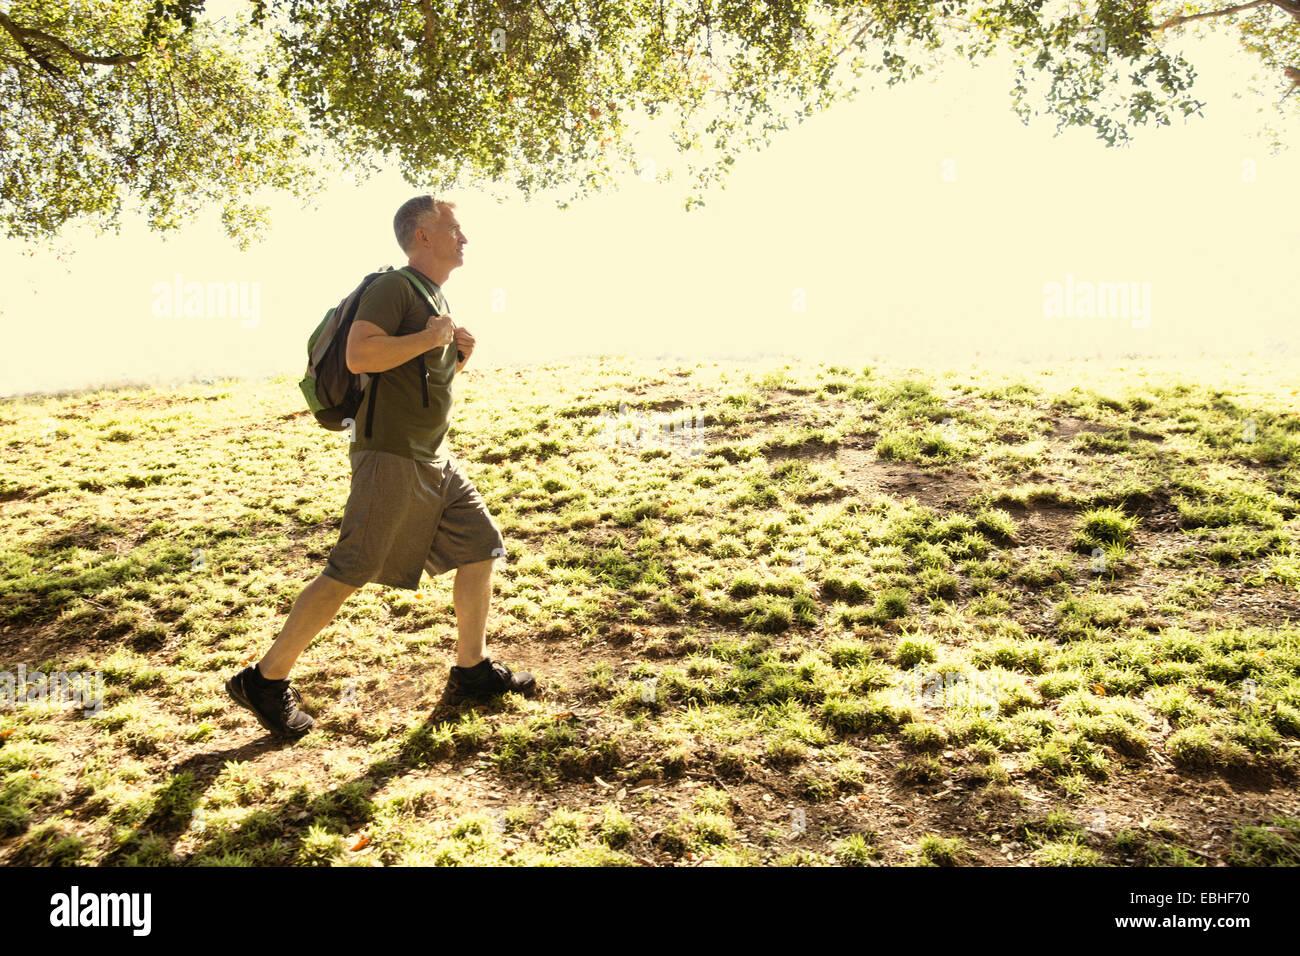 Man power walking in park Photo Stock